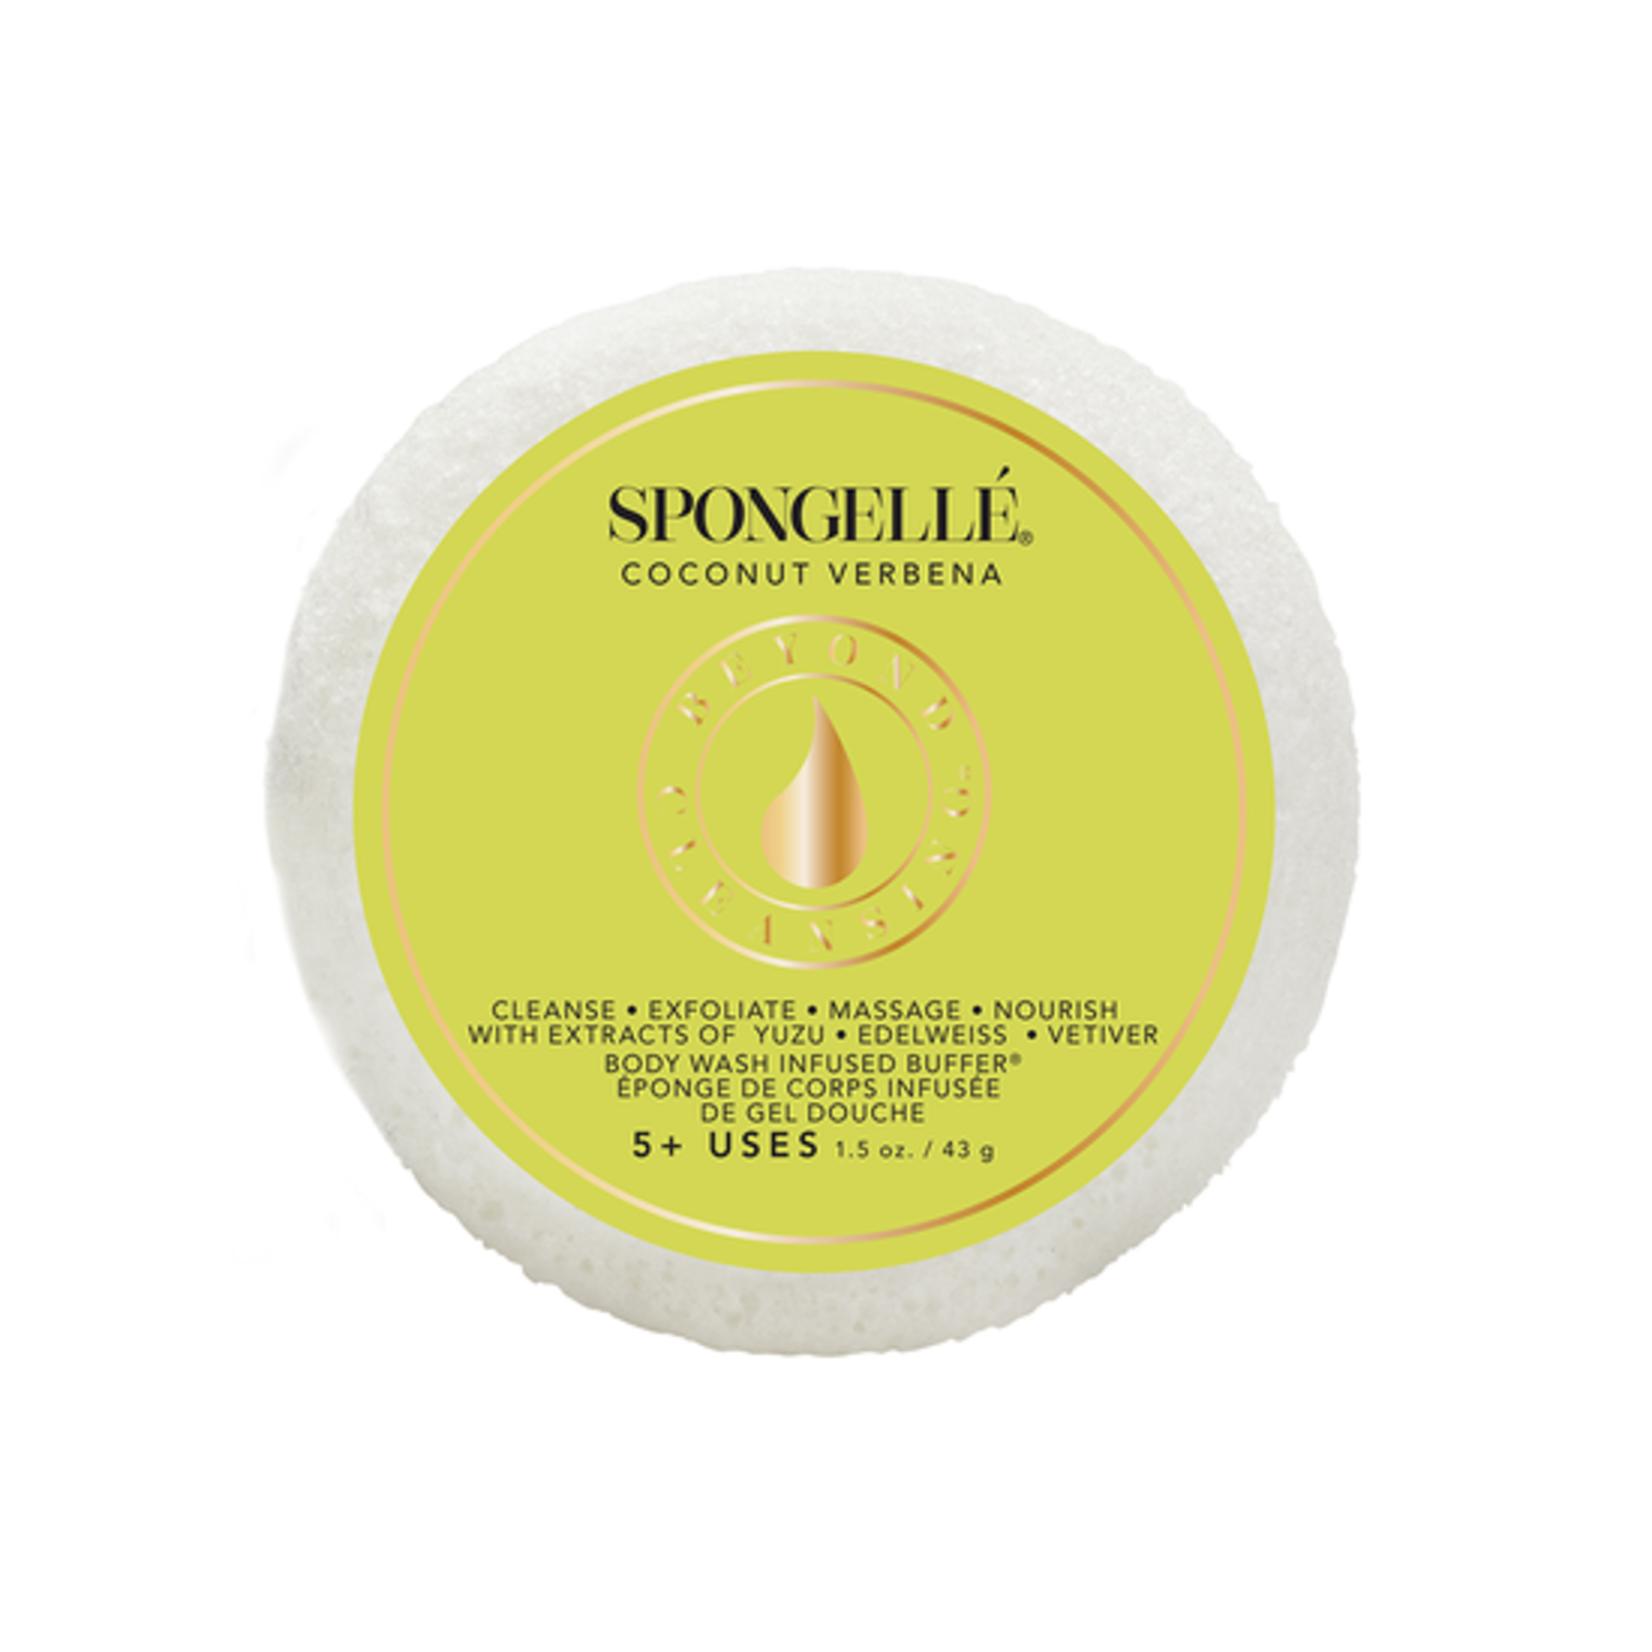 Spongelle Coconut Verbena | Travel Spongette